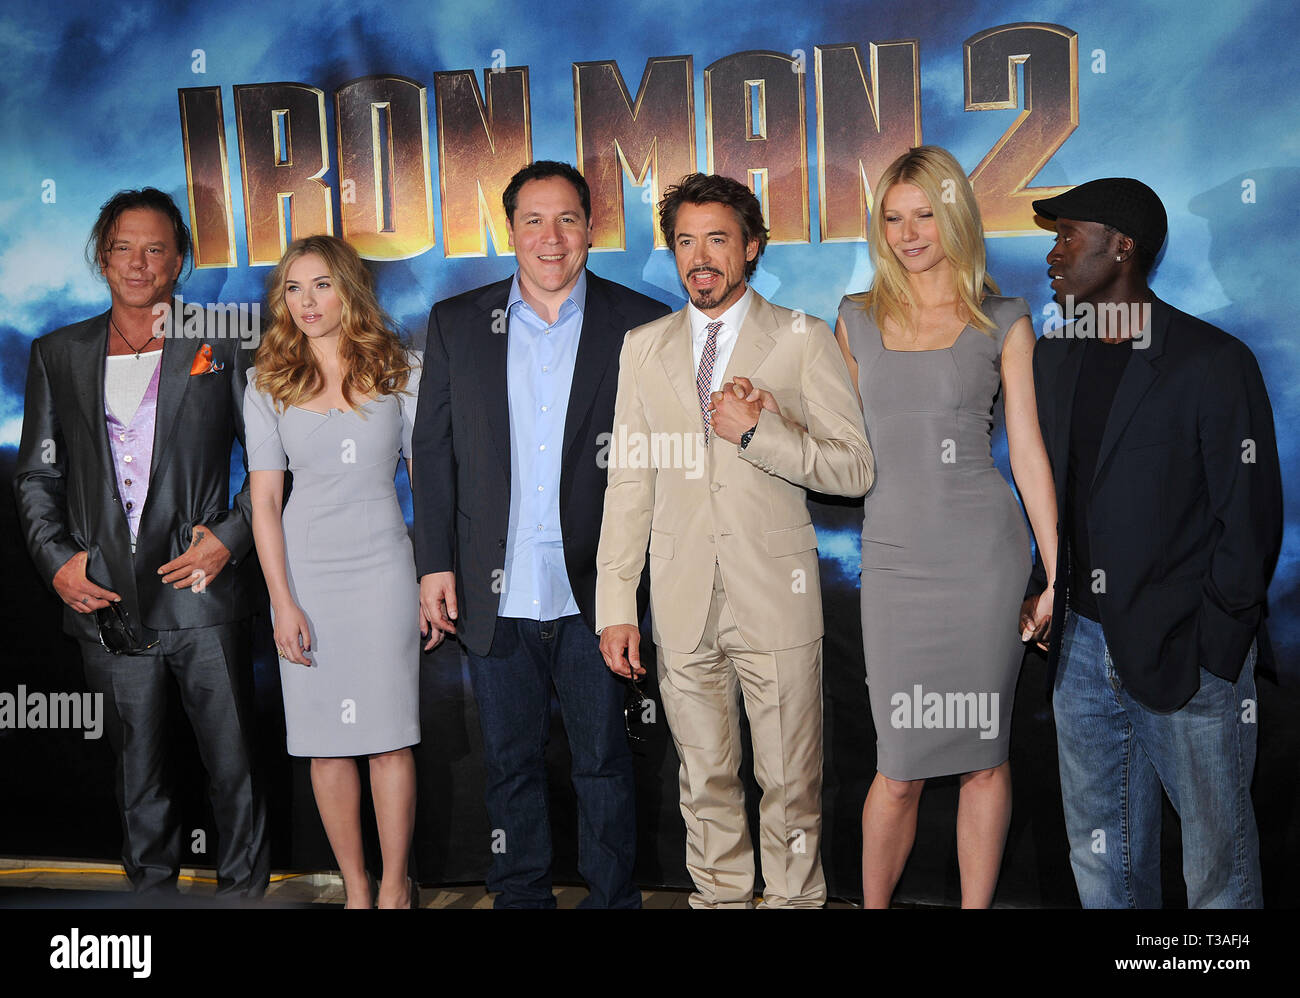 Iron Man 2 cast 73 - IRON MAN 2 Photo Call at the Four ...